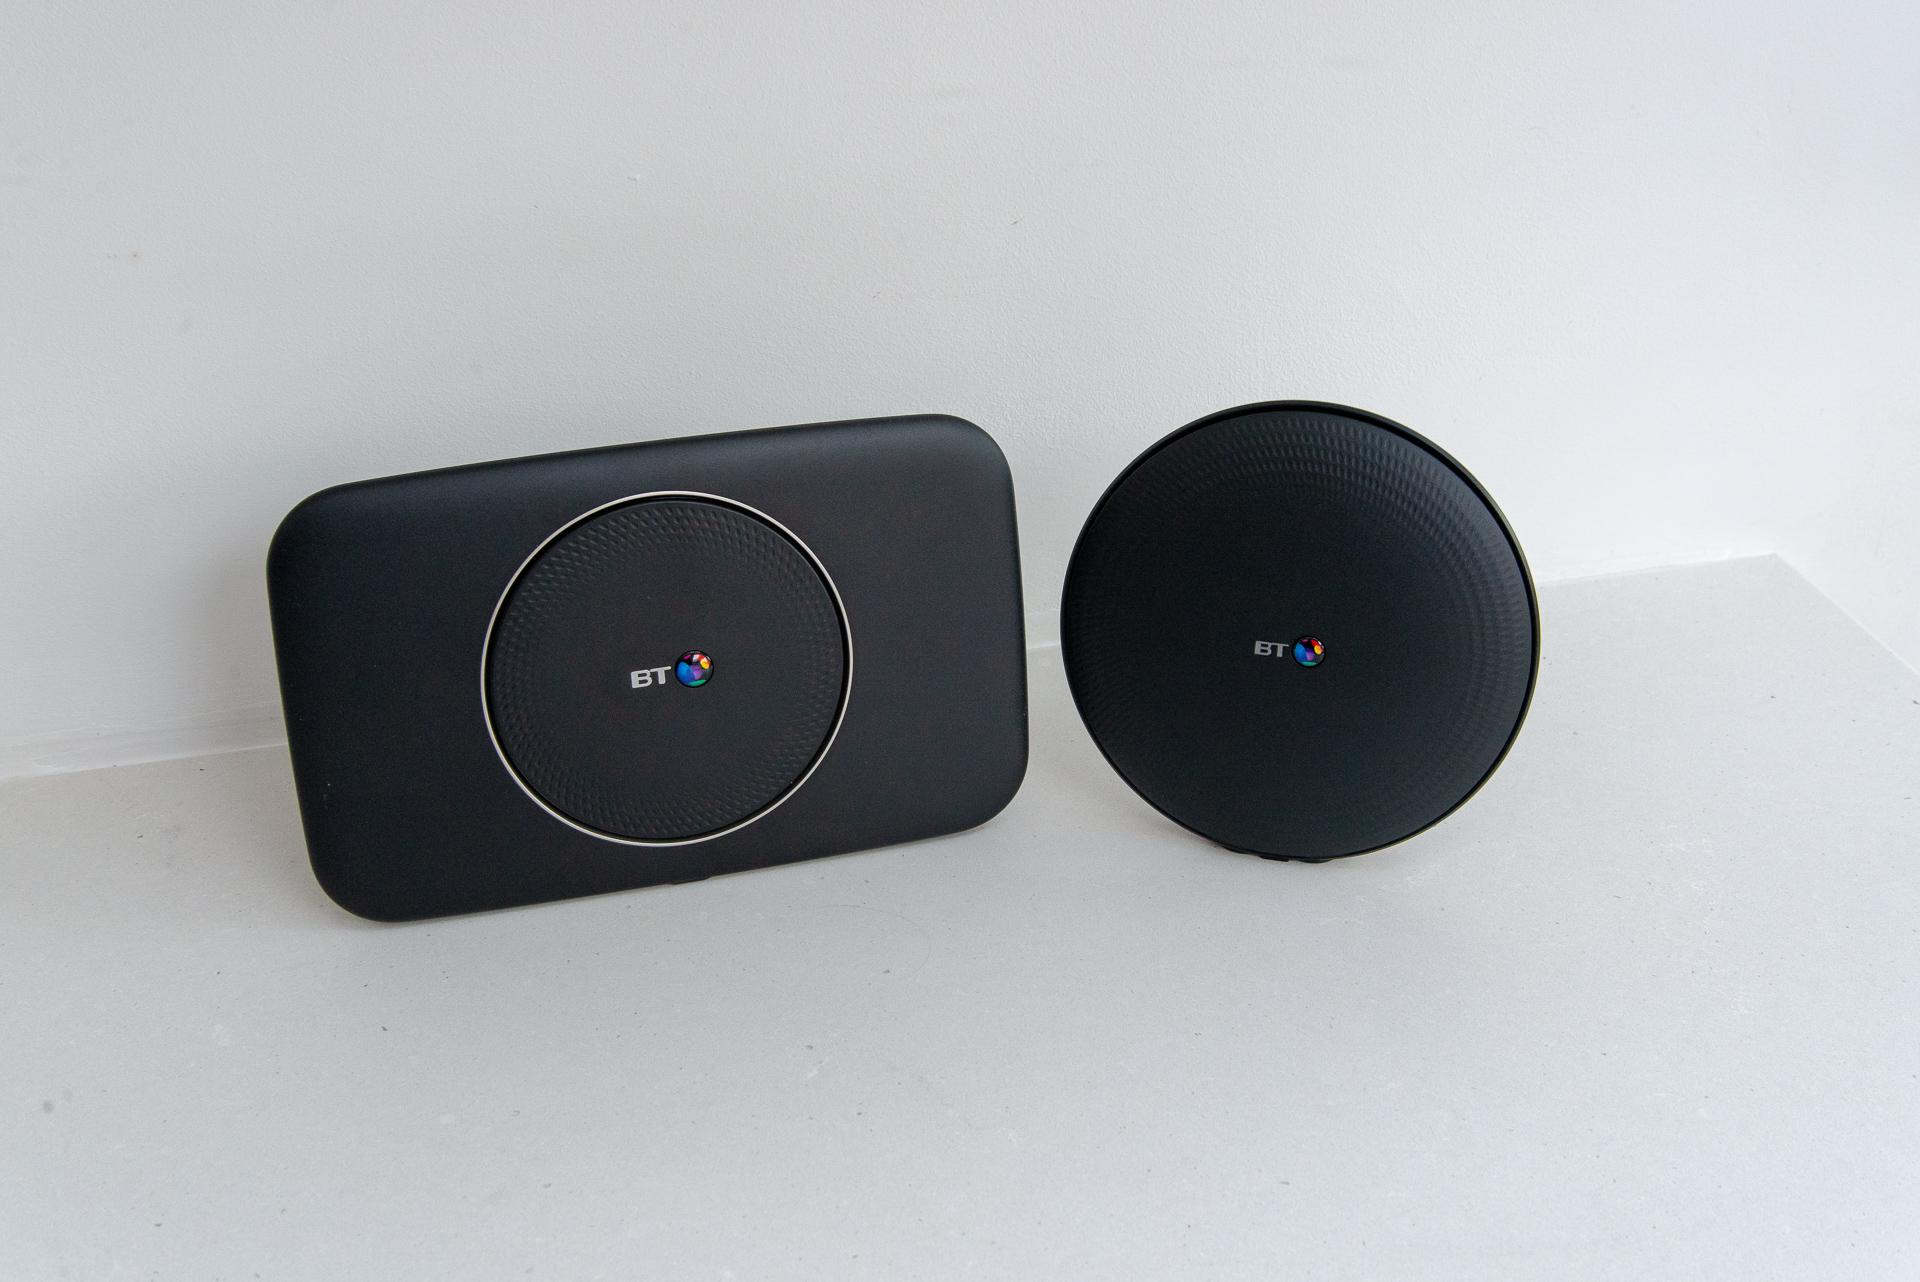 BT Complete Wi-Fi hero